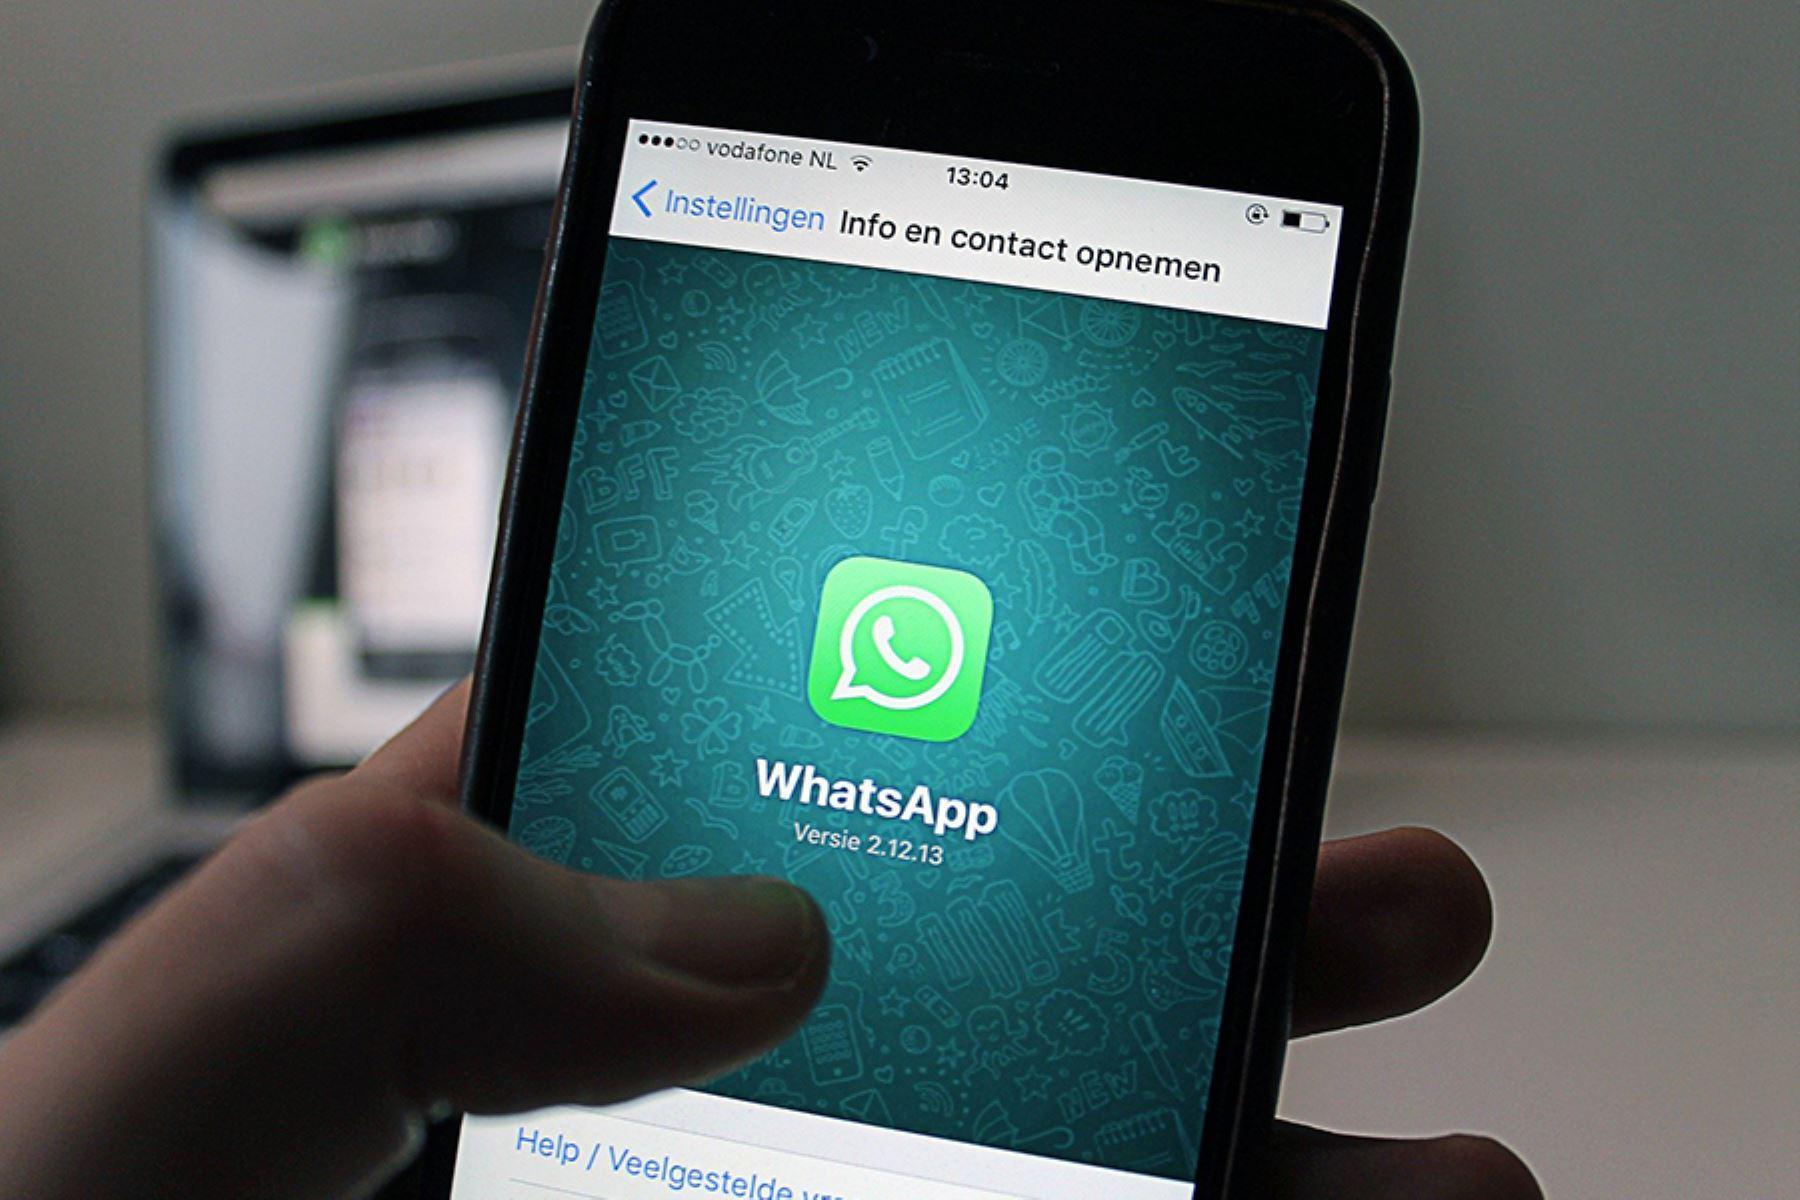 WhatsApp bloquea 2 millones de usuarios en un mes en India por abuso de mensajes